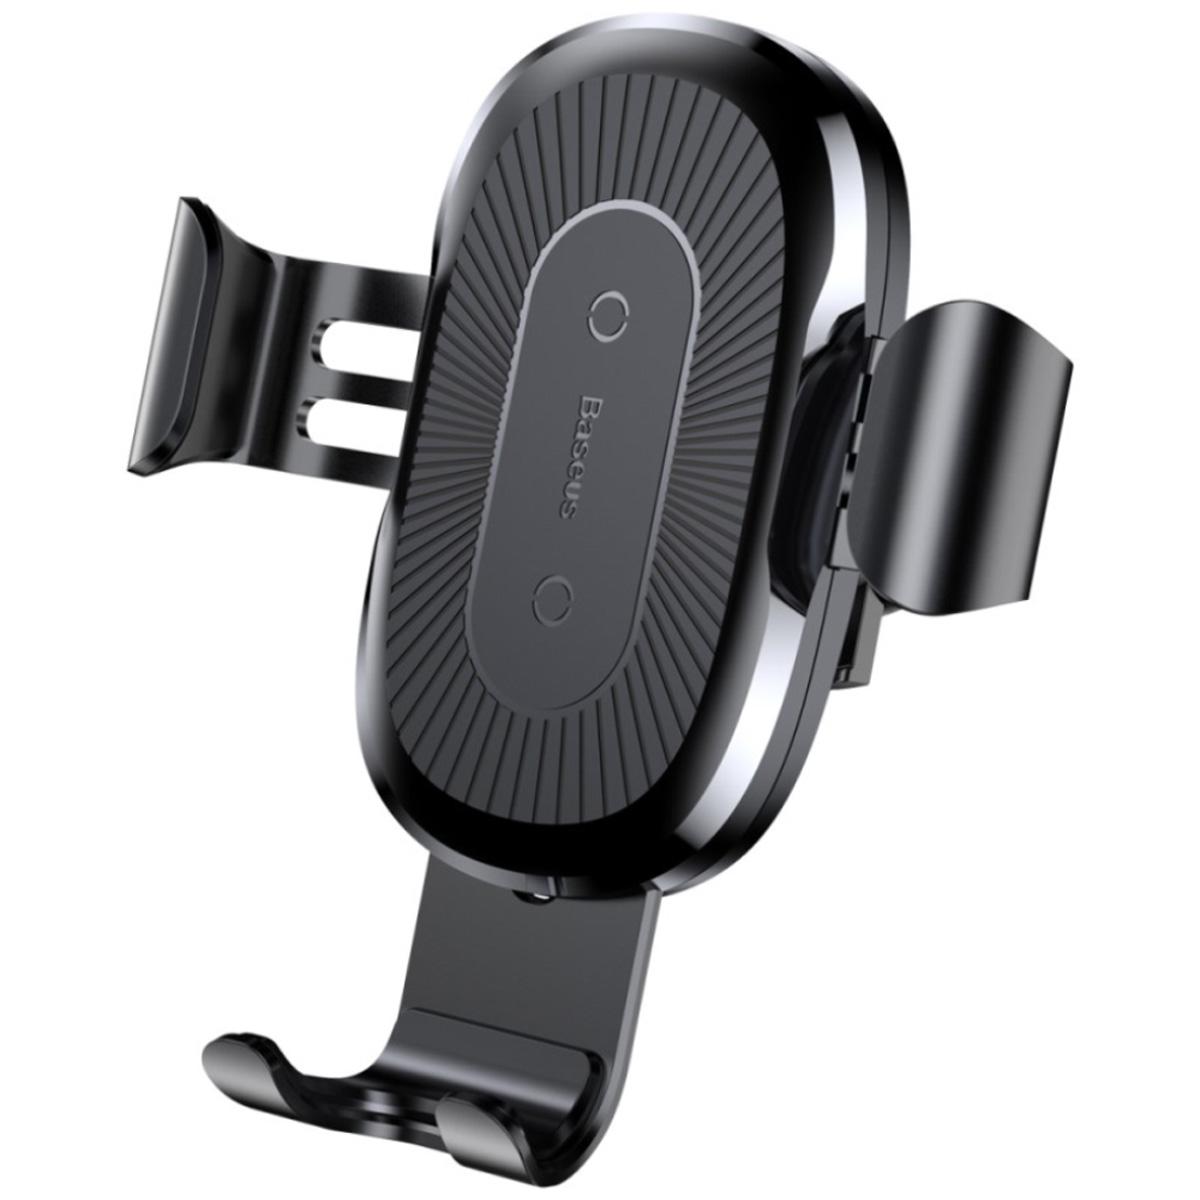 auto kfz smartphone handy halterung wireless charging. Black Bedroom Furniture Sets. Home Design Ideas